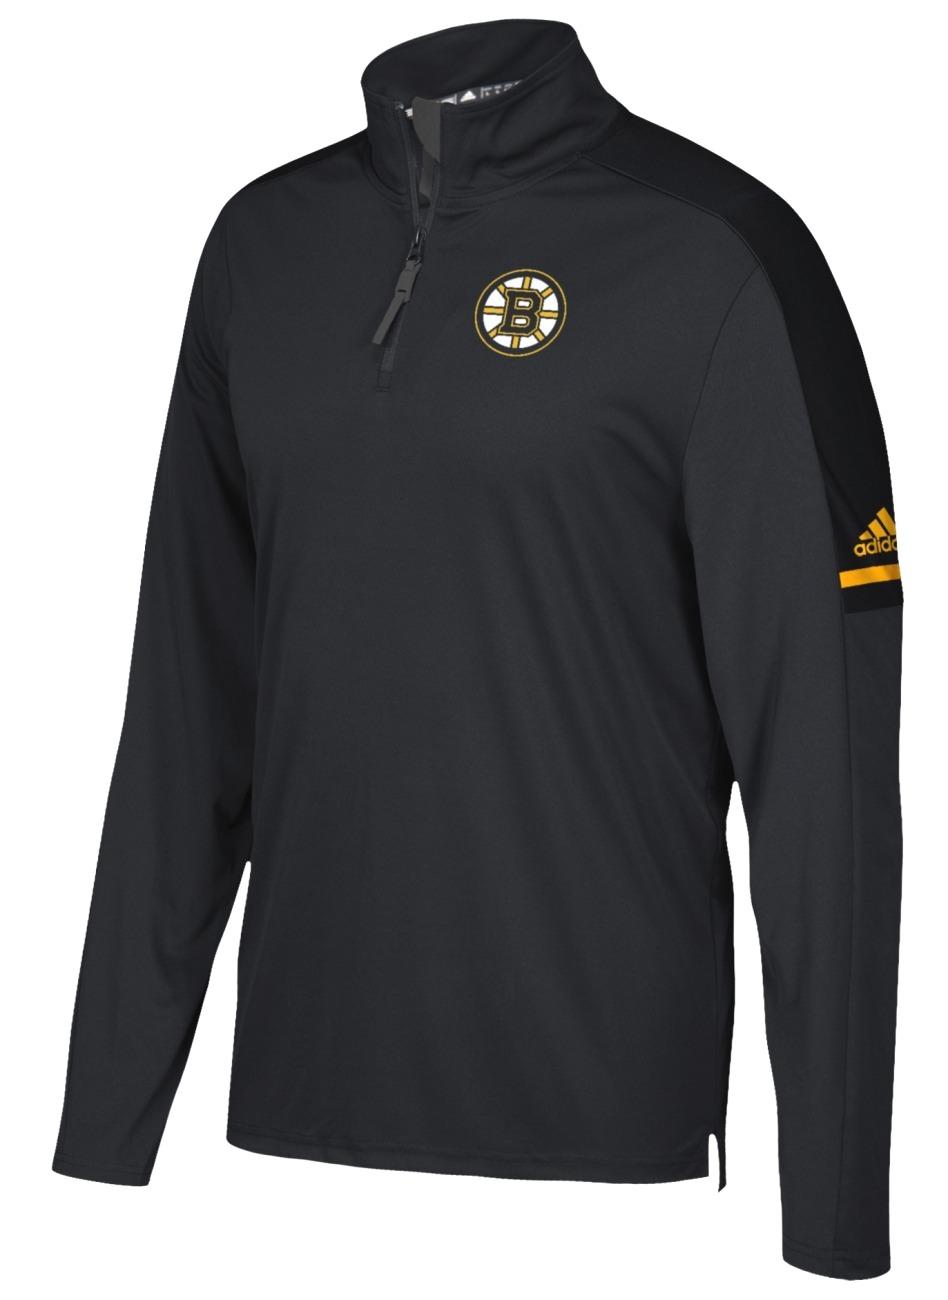 Boston Bruins Adidas NHL Men's 2017 Authentic Pro 1/4 Zip Wind Shirt